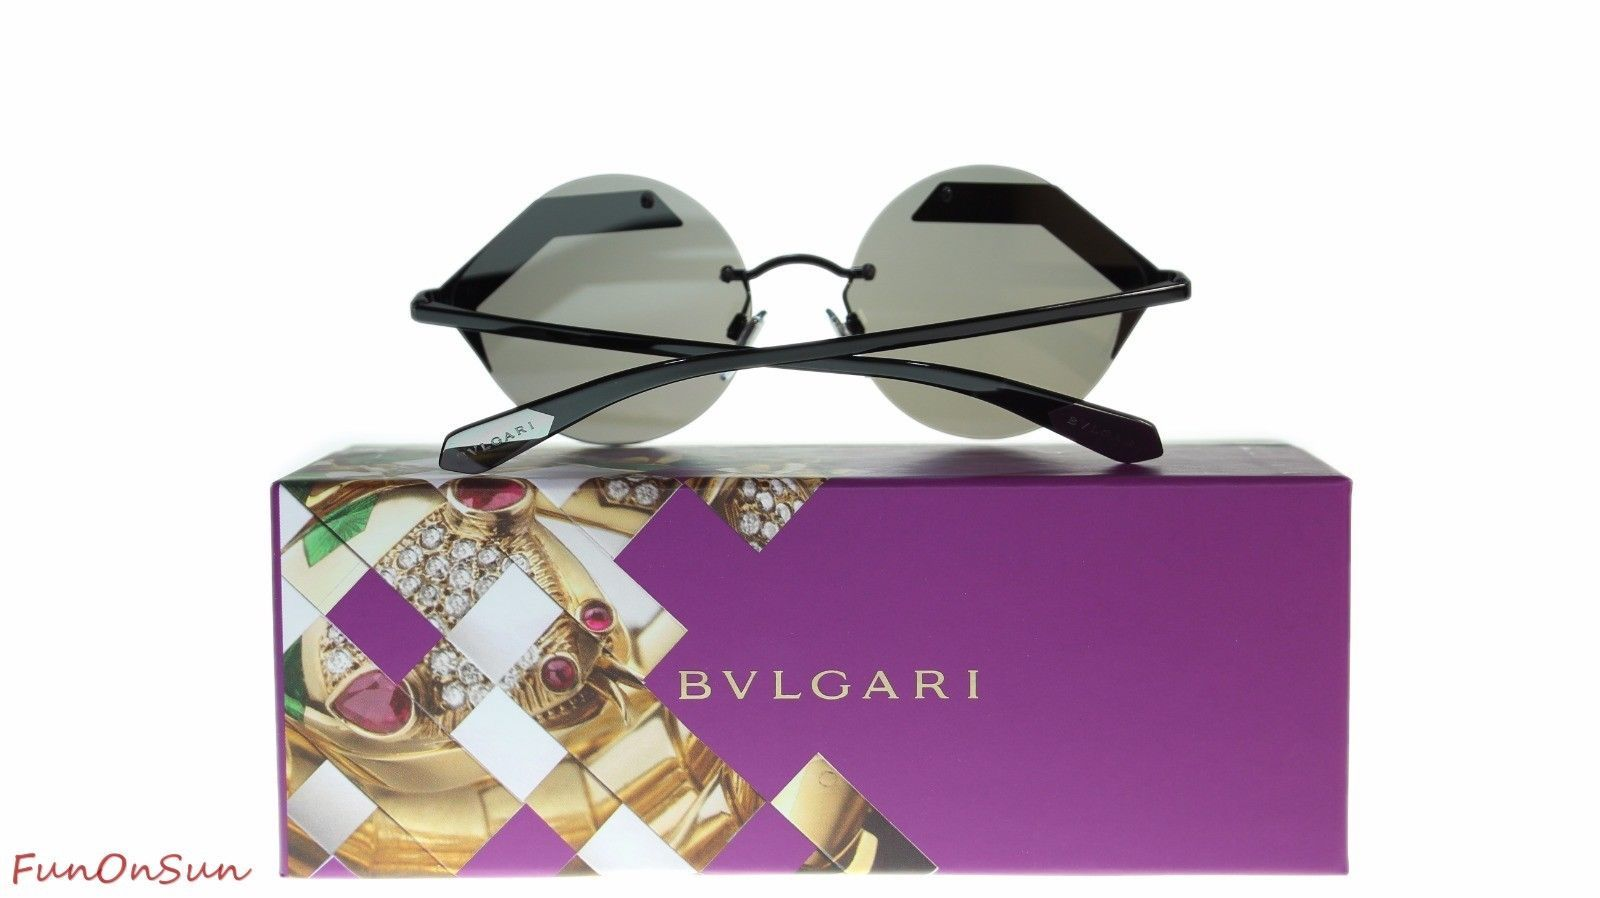 BVLGARI Women's Round Sunglasses BV6089 128/6G Matte Black/Light Grey Lens 55mm